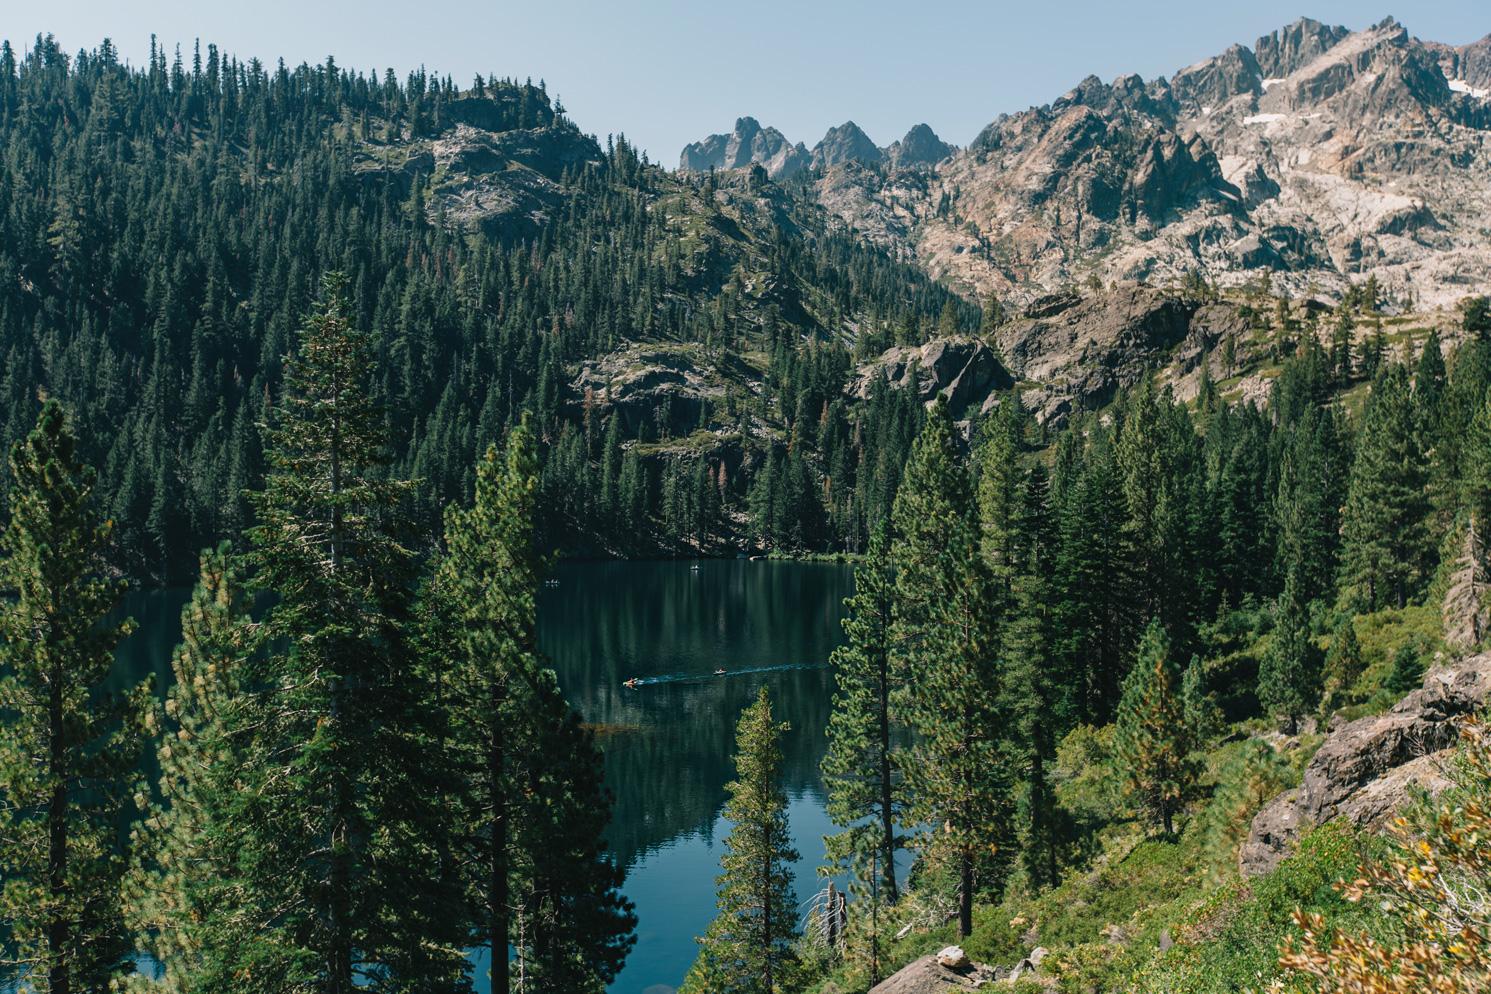 CindyGiovagnoli_outdoors_photographer_Sierra_Buttes_firetower_watchtower_Sardine_Snag_Bear_lake_hike_swim_camp-048.jpg